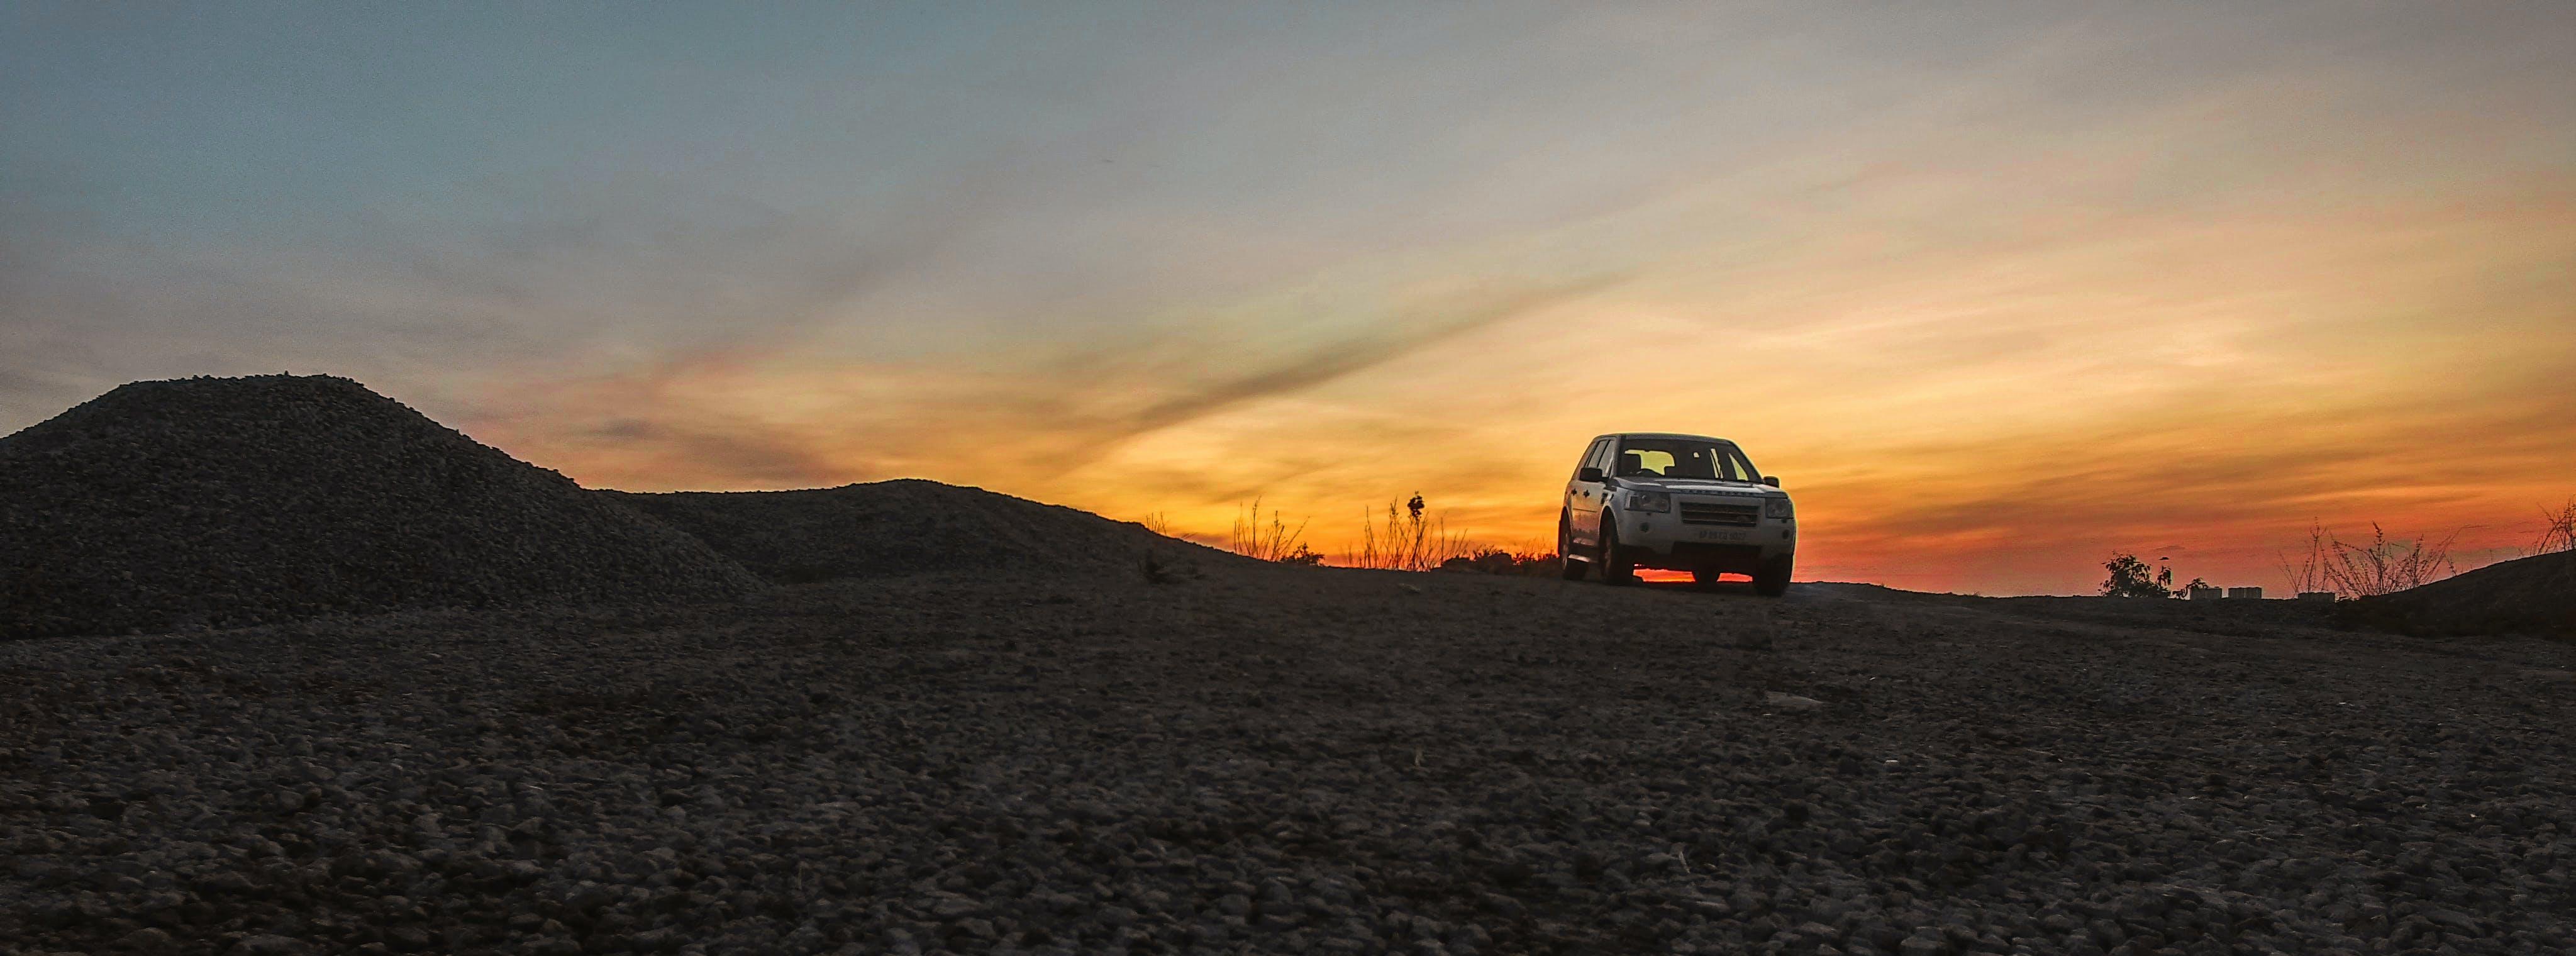 Free stock photo of car, golden sunset, land rover, landscape